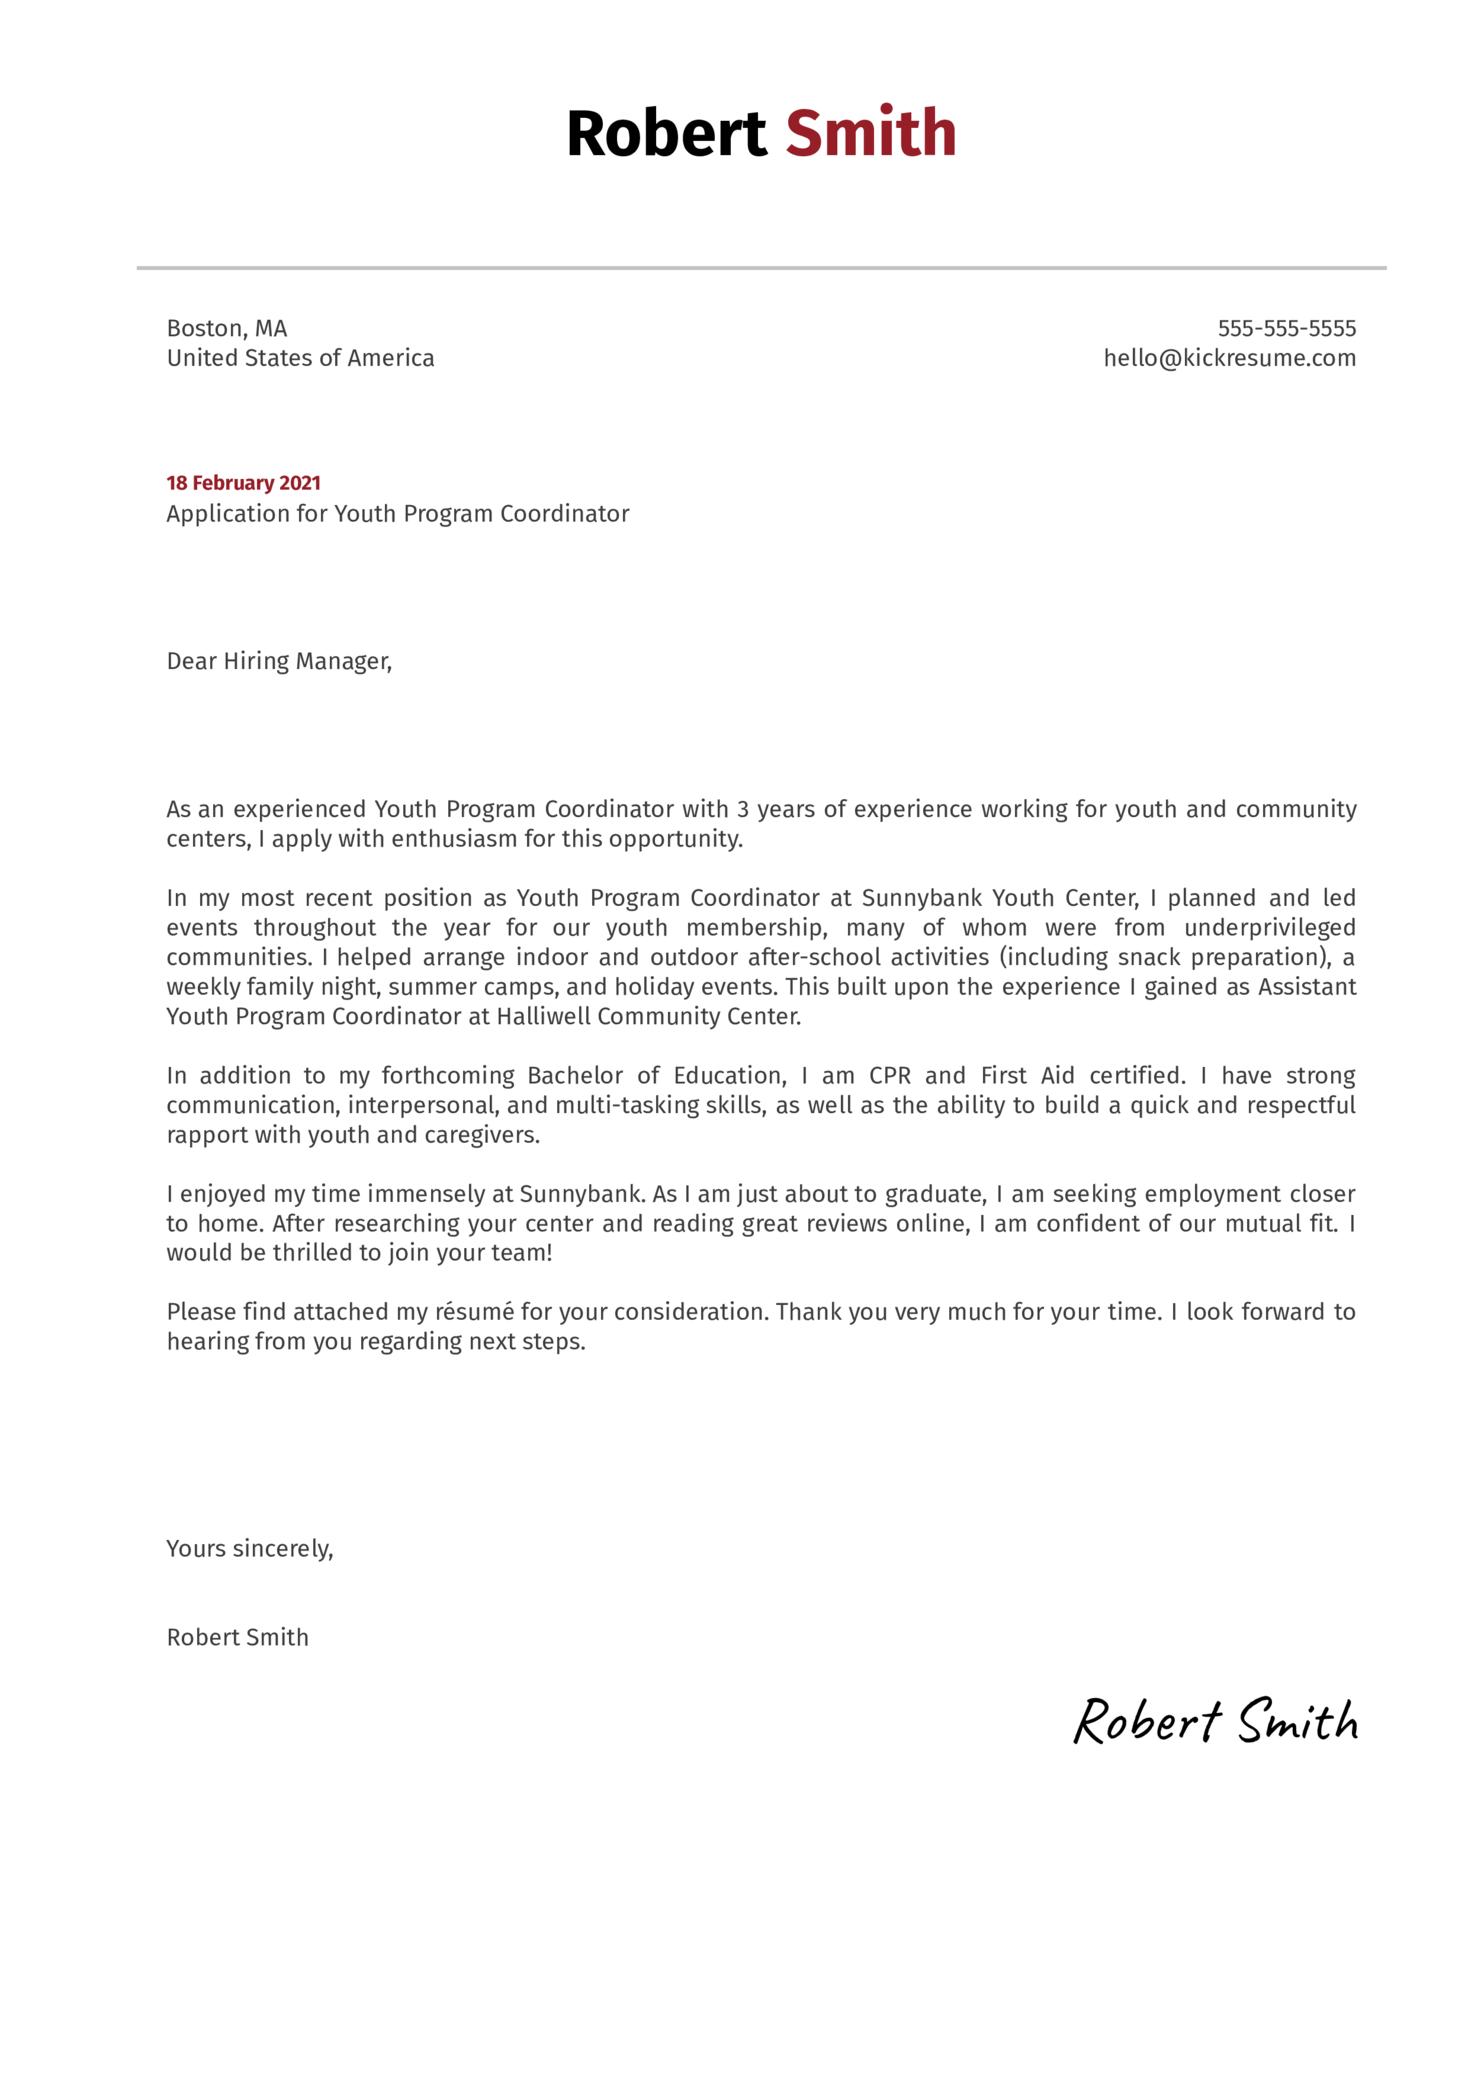 Youth Program Coordinator Cover Letter Sample